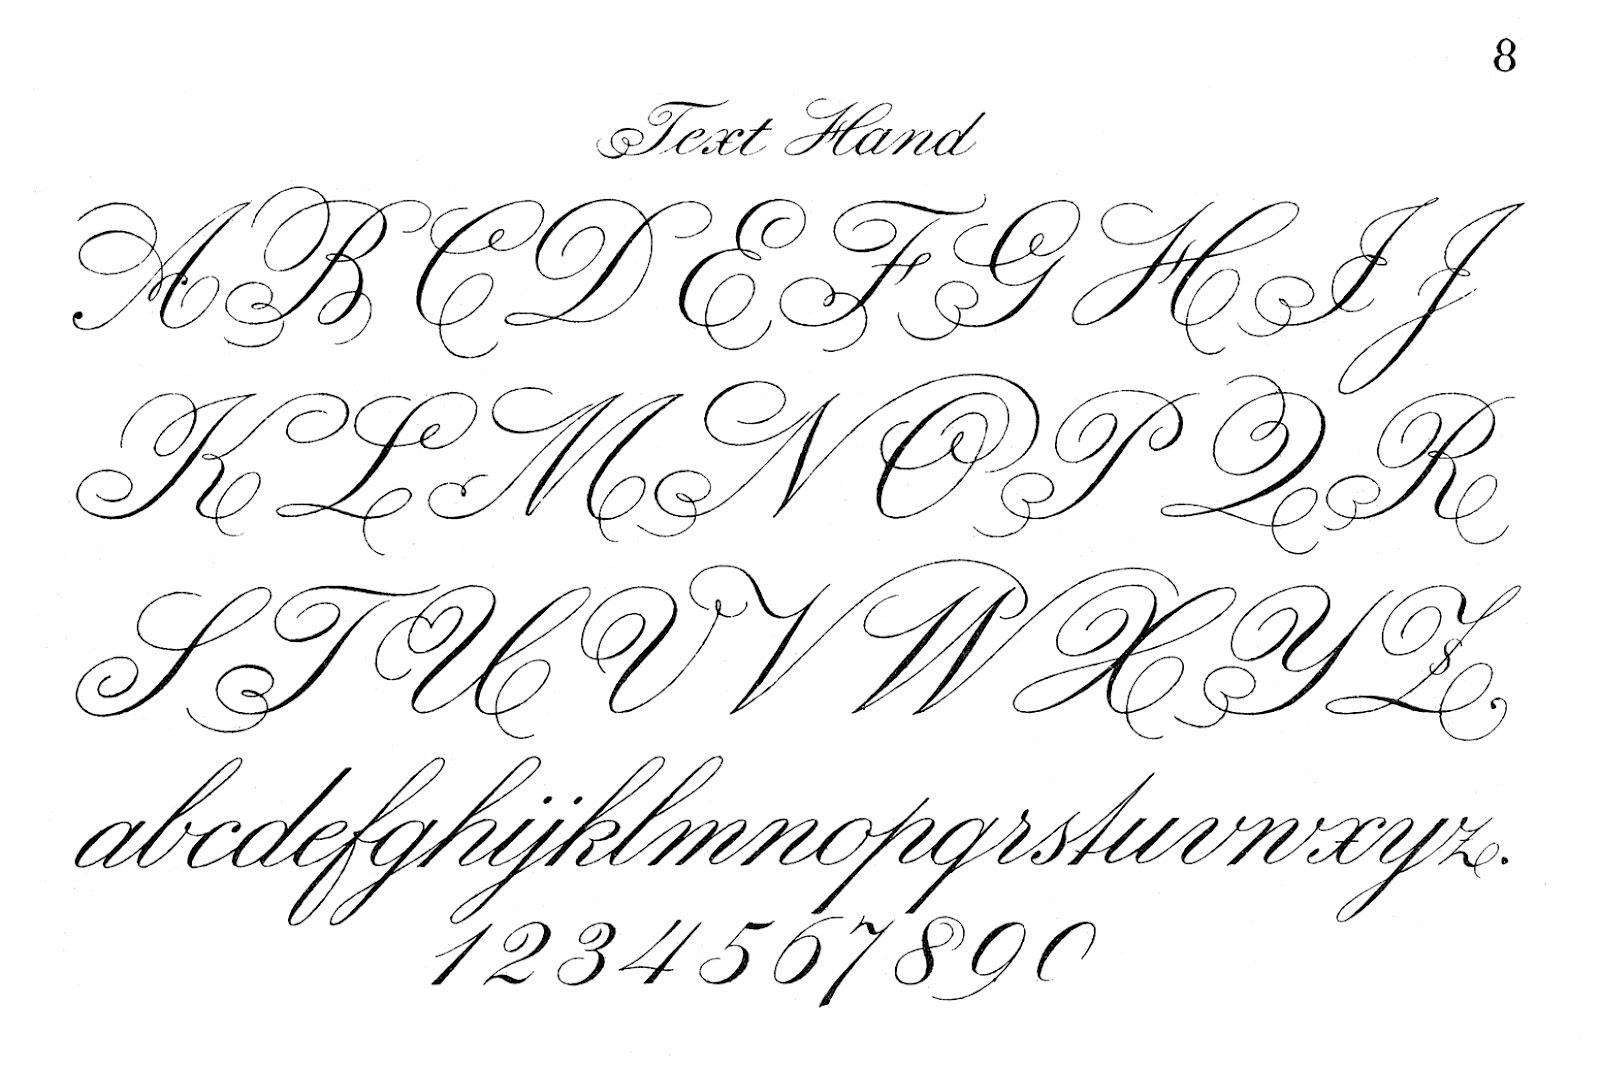 1600 X 1068 267 KB Jpeg Letter Fancy Script Fonts 1600x1068